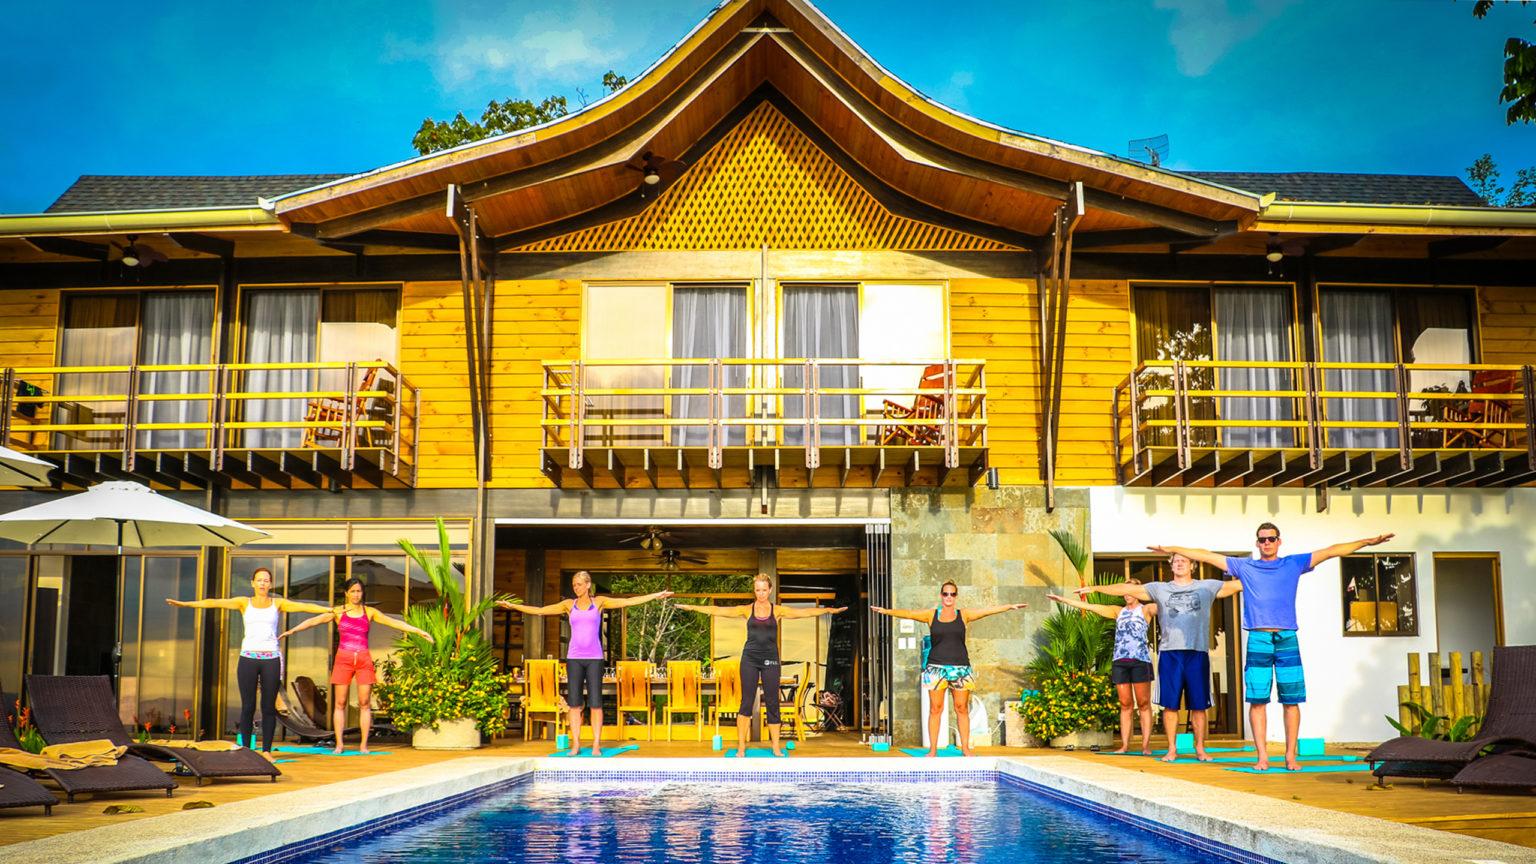 Kalon Surf Pilates and Surf Camp Costa Rica